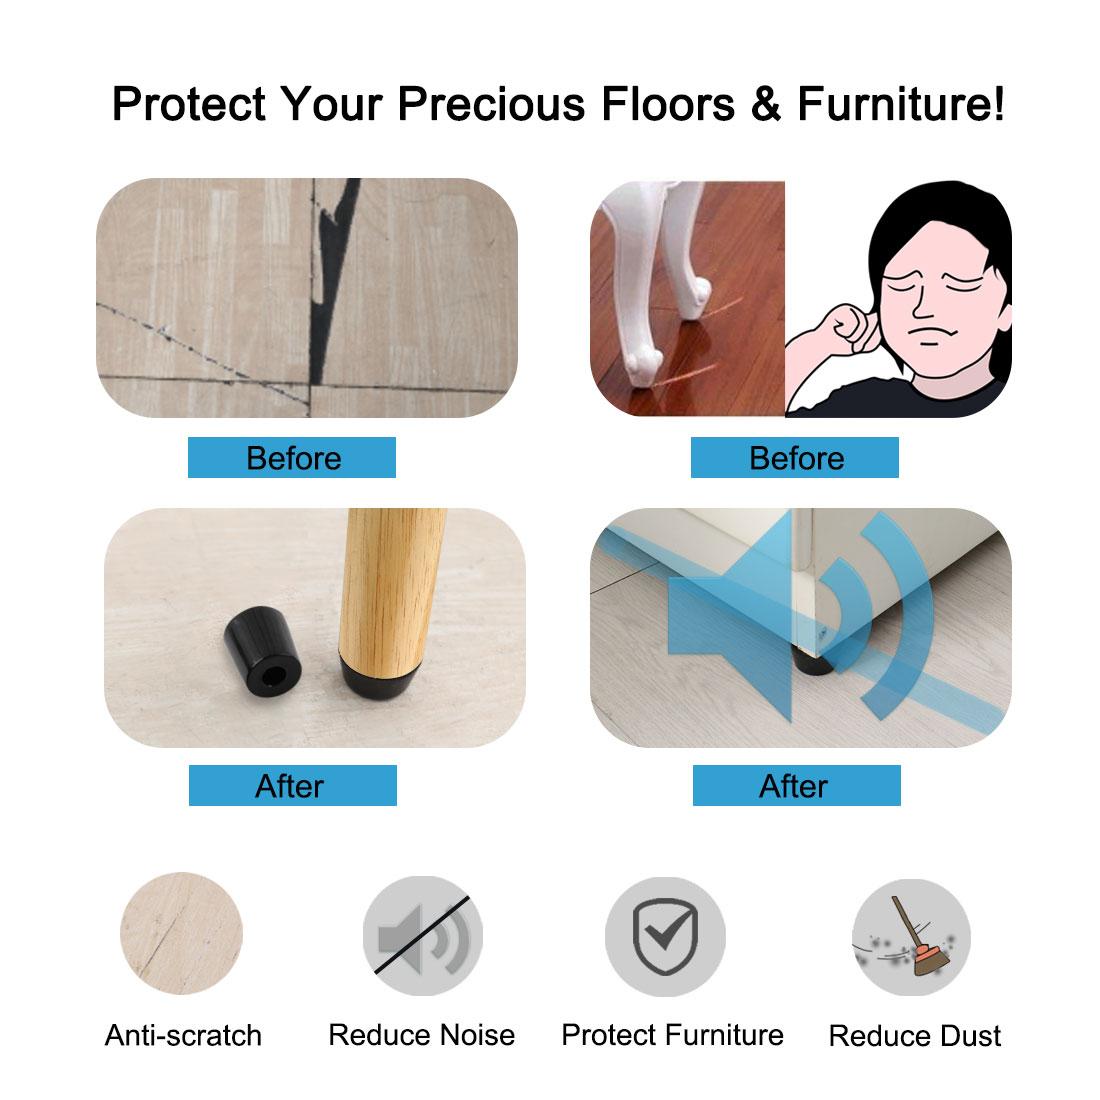 34pcs Rubber Feet Bumper Furniture Table Leg Pads Floor Protector, D33x27xH33mm - image 6 of 7